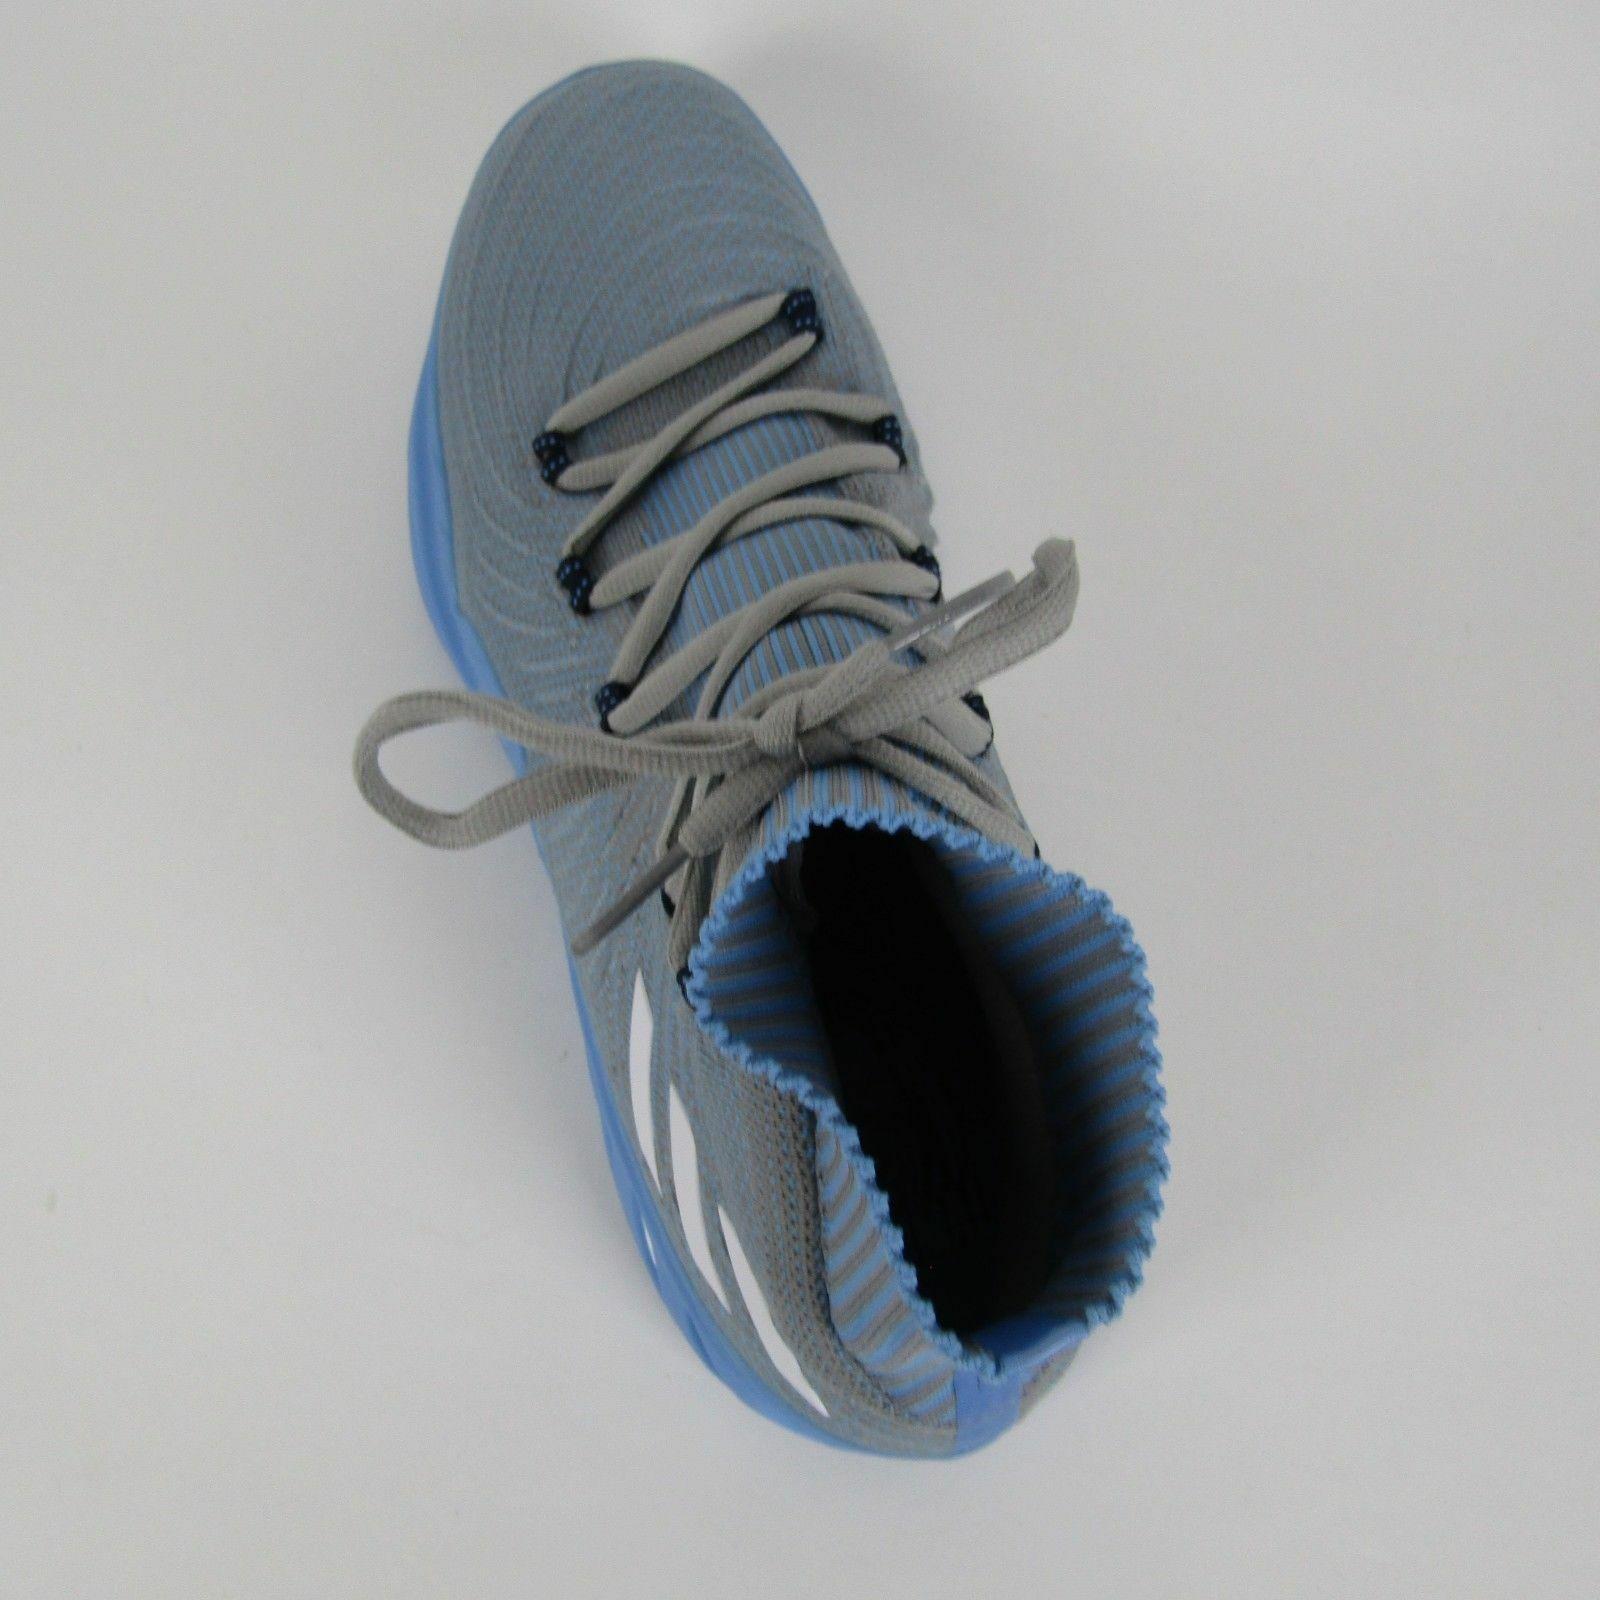 Adidas Crazy Esplosiva Primeknit Kenneth Sonia Ferrari Pe Pepite Nets AC8724 image 4